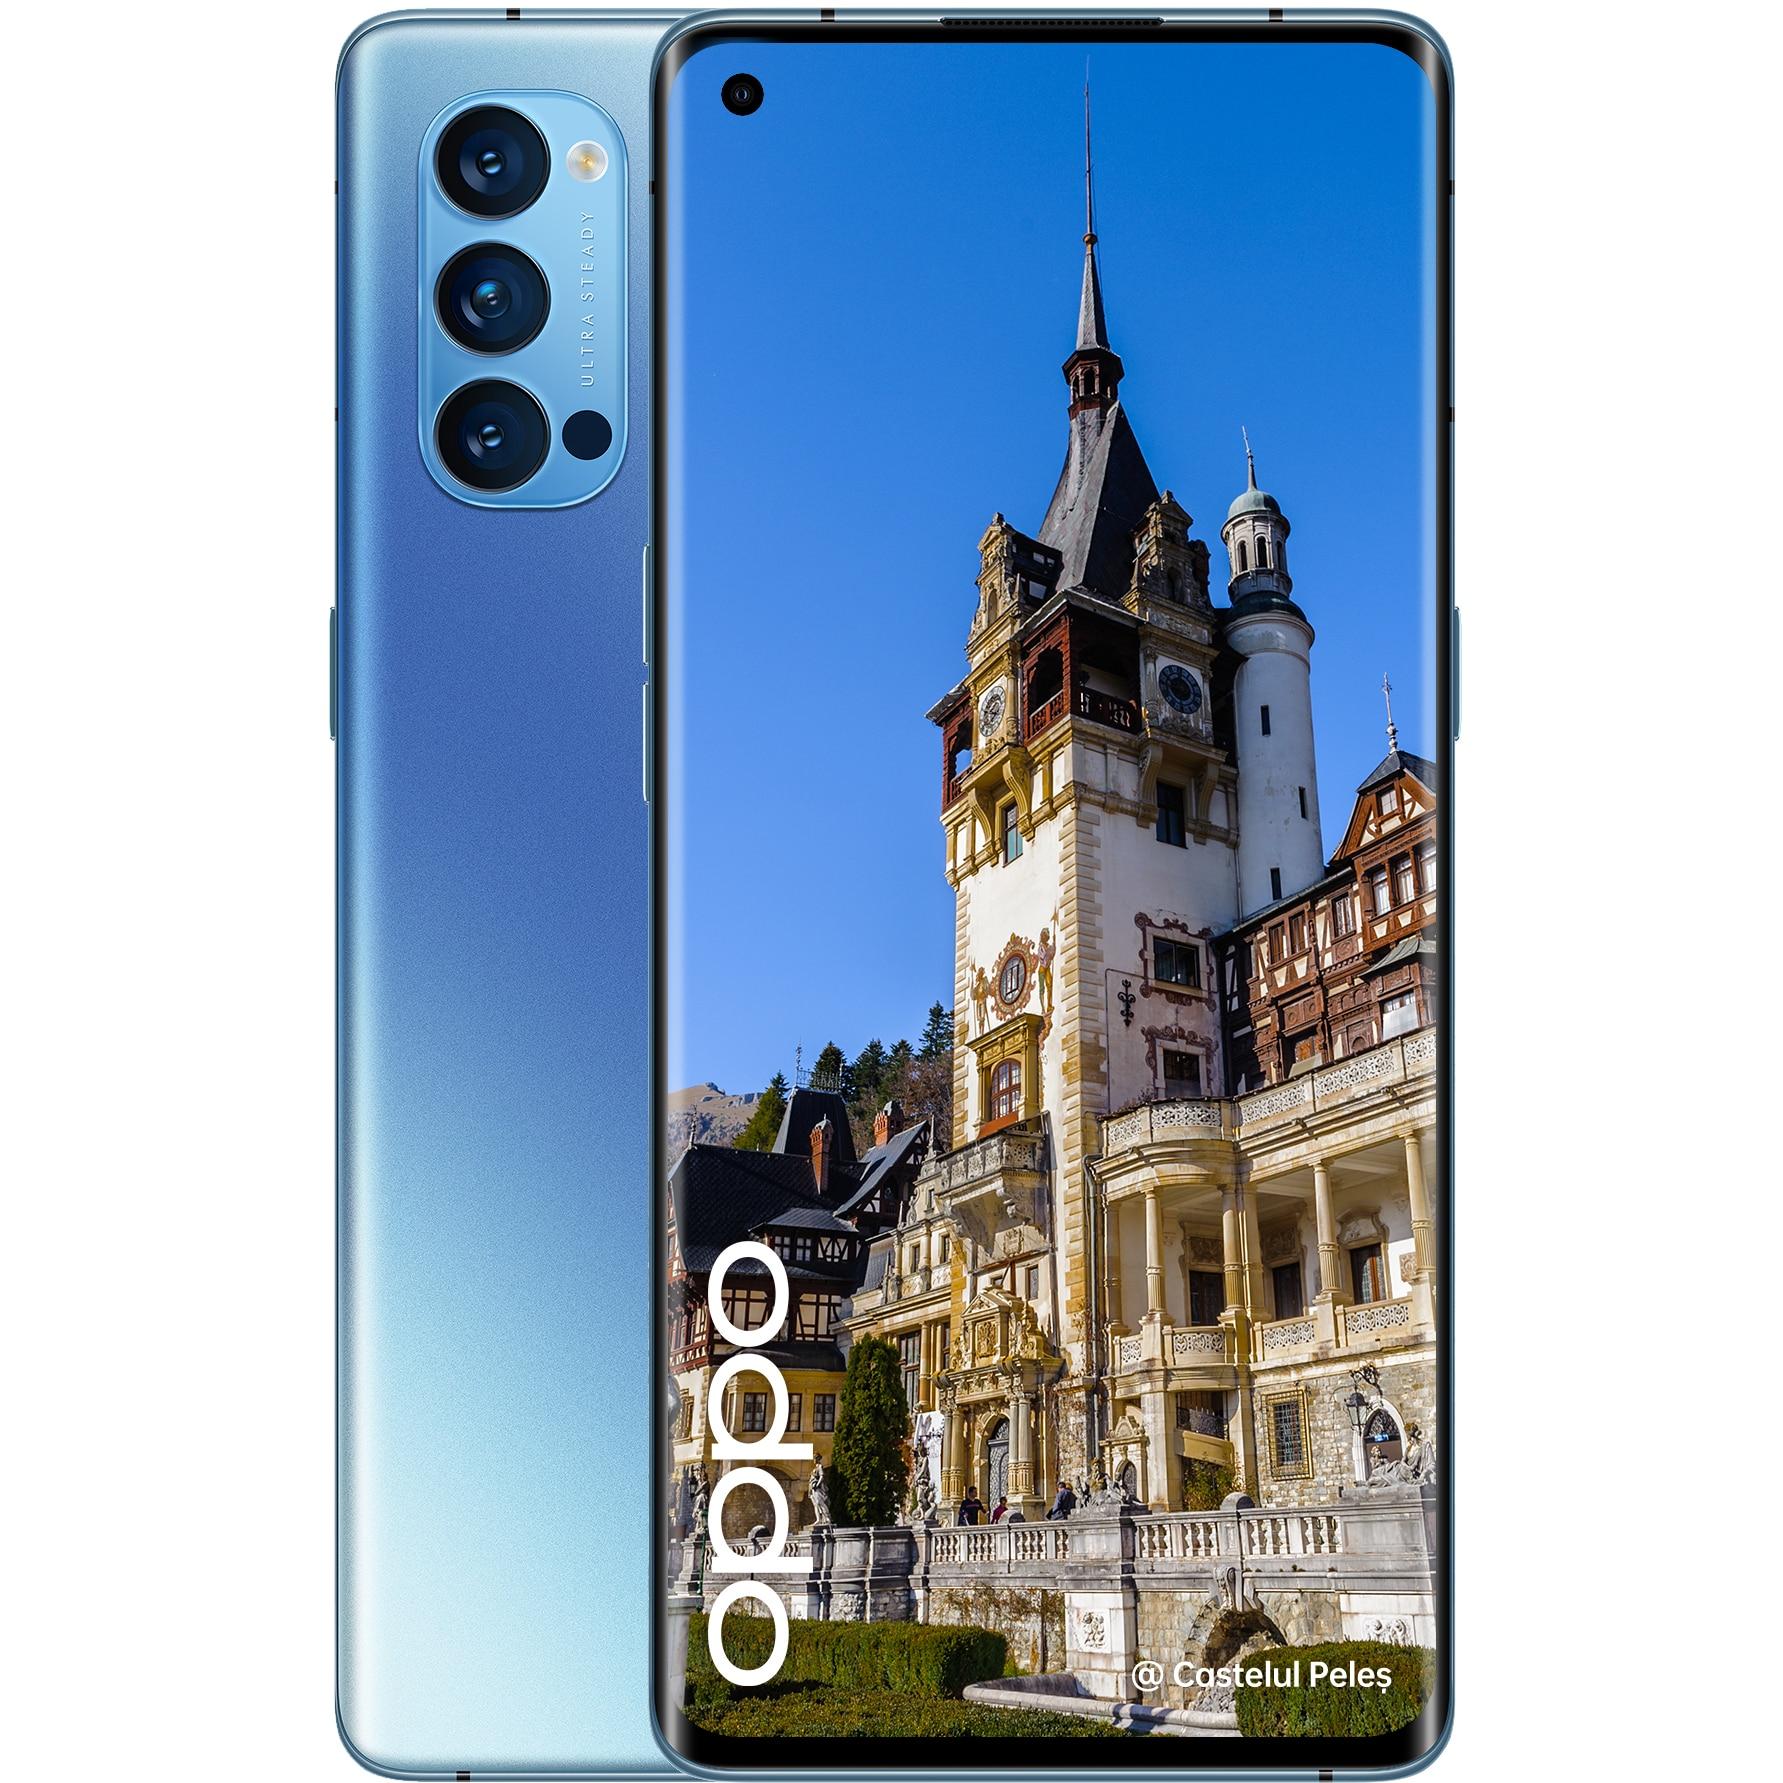 Fotografie Telefon mobil Oppo Reno 4 Pro, Dual SIM, 256GB, 12GB RAM, 5G, Galactic Blue